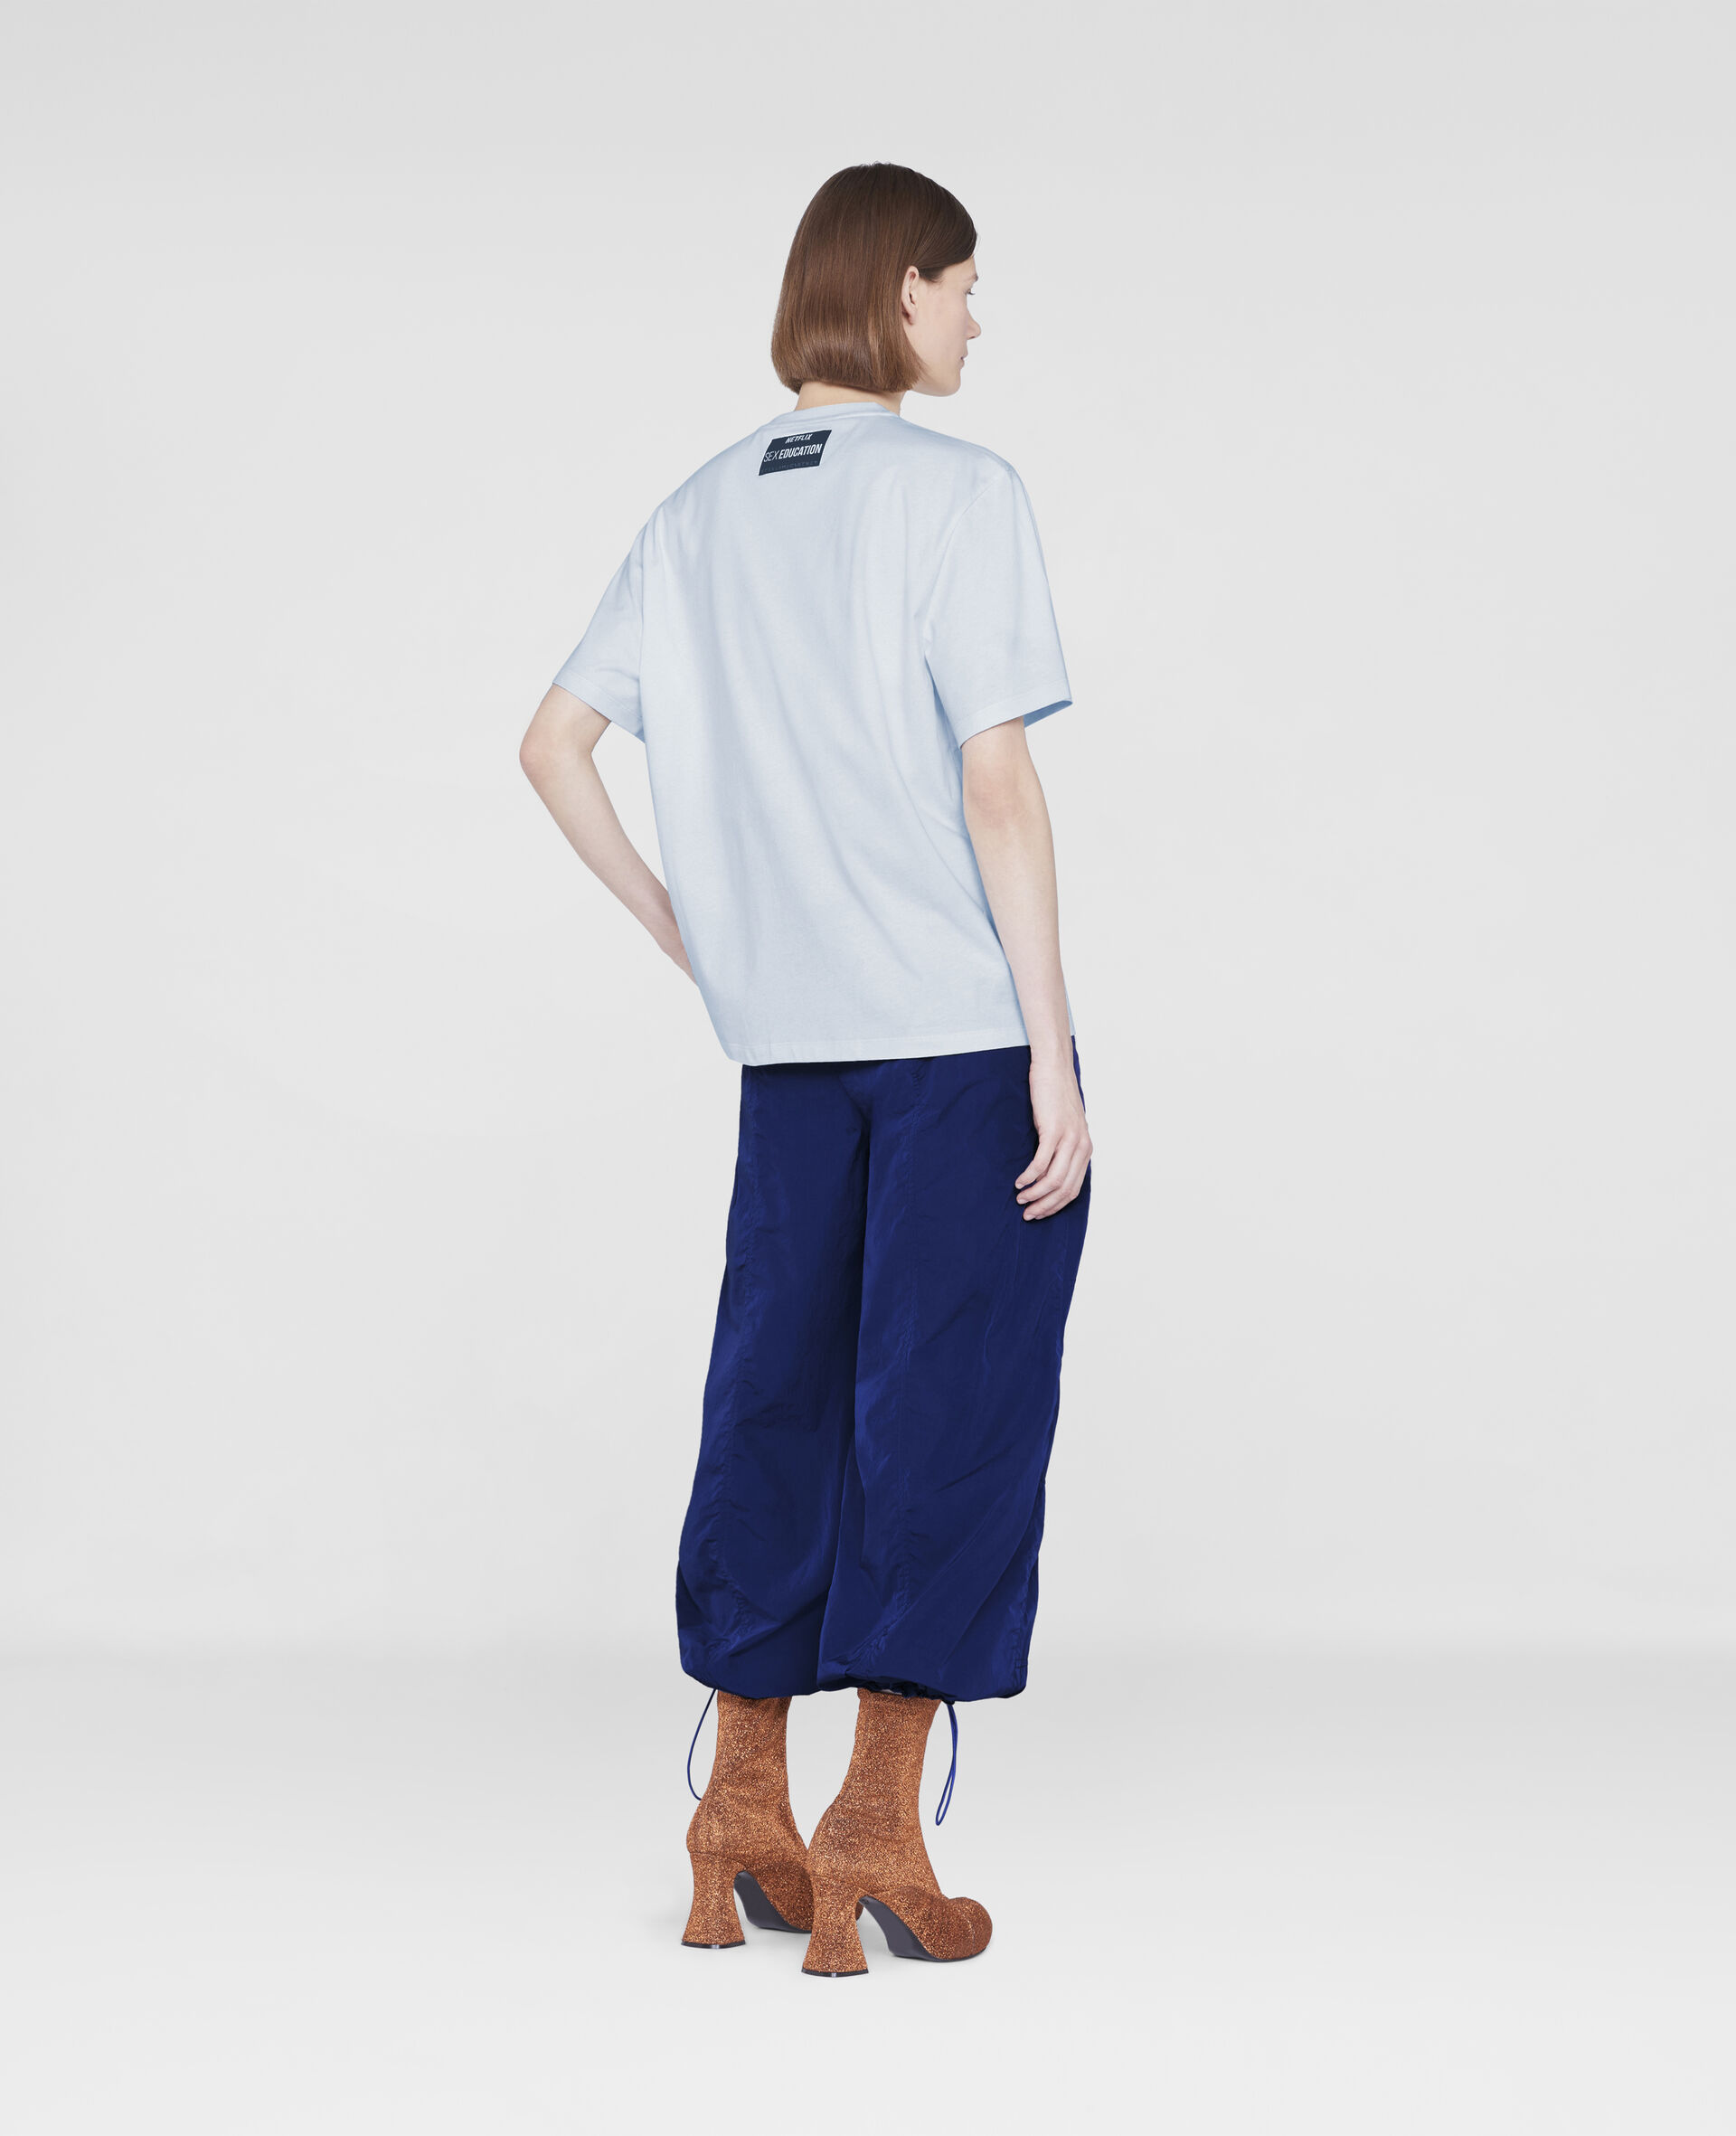 BCA 2021: Toilet, Tits, Teeth (TTT) T-shirt-Blue-large image number 2